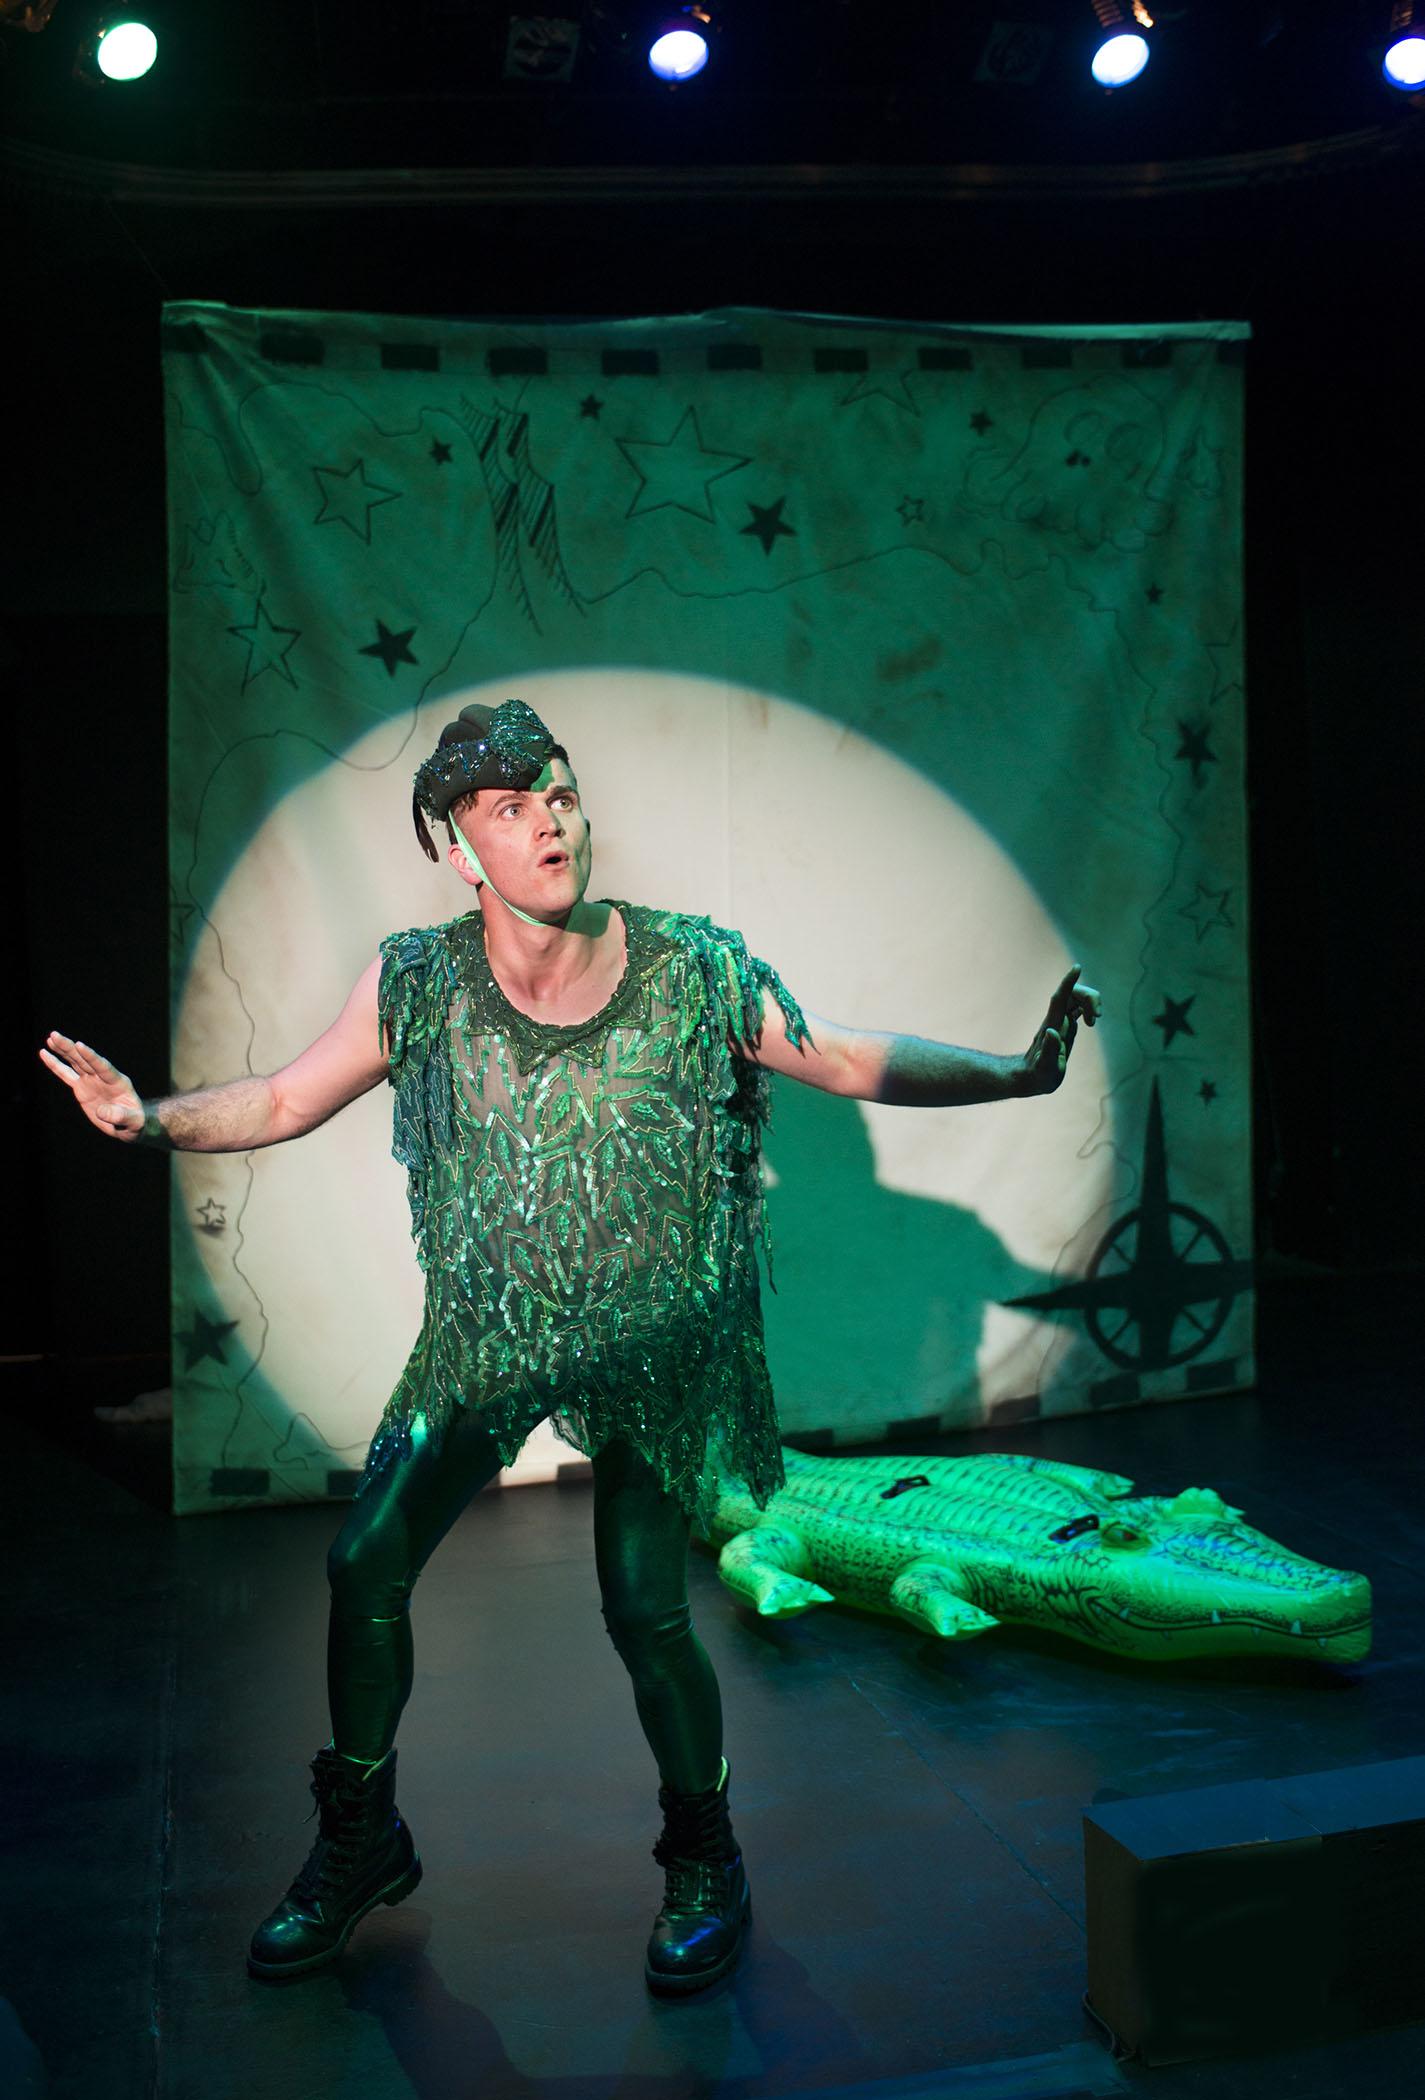 Evan Johnson.    Scenic Design by Devin Kasper, Costume Design by Eli Magid,  Lighting Design by Christian Mejia, Sound Design by Teddy Hulsker, Photography by Lois Tema.